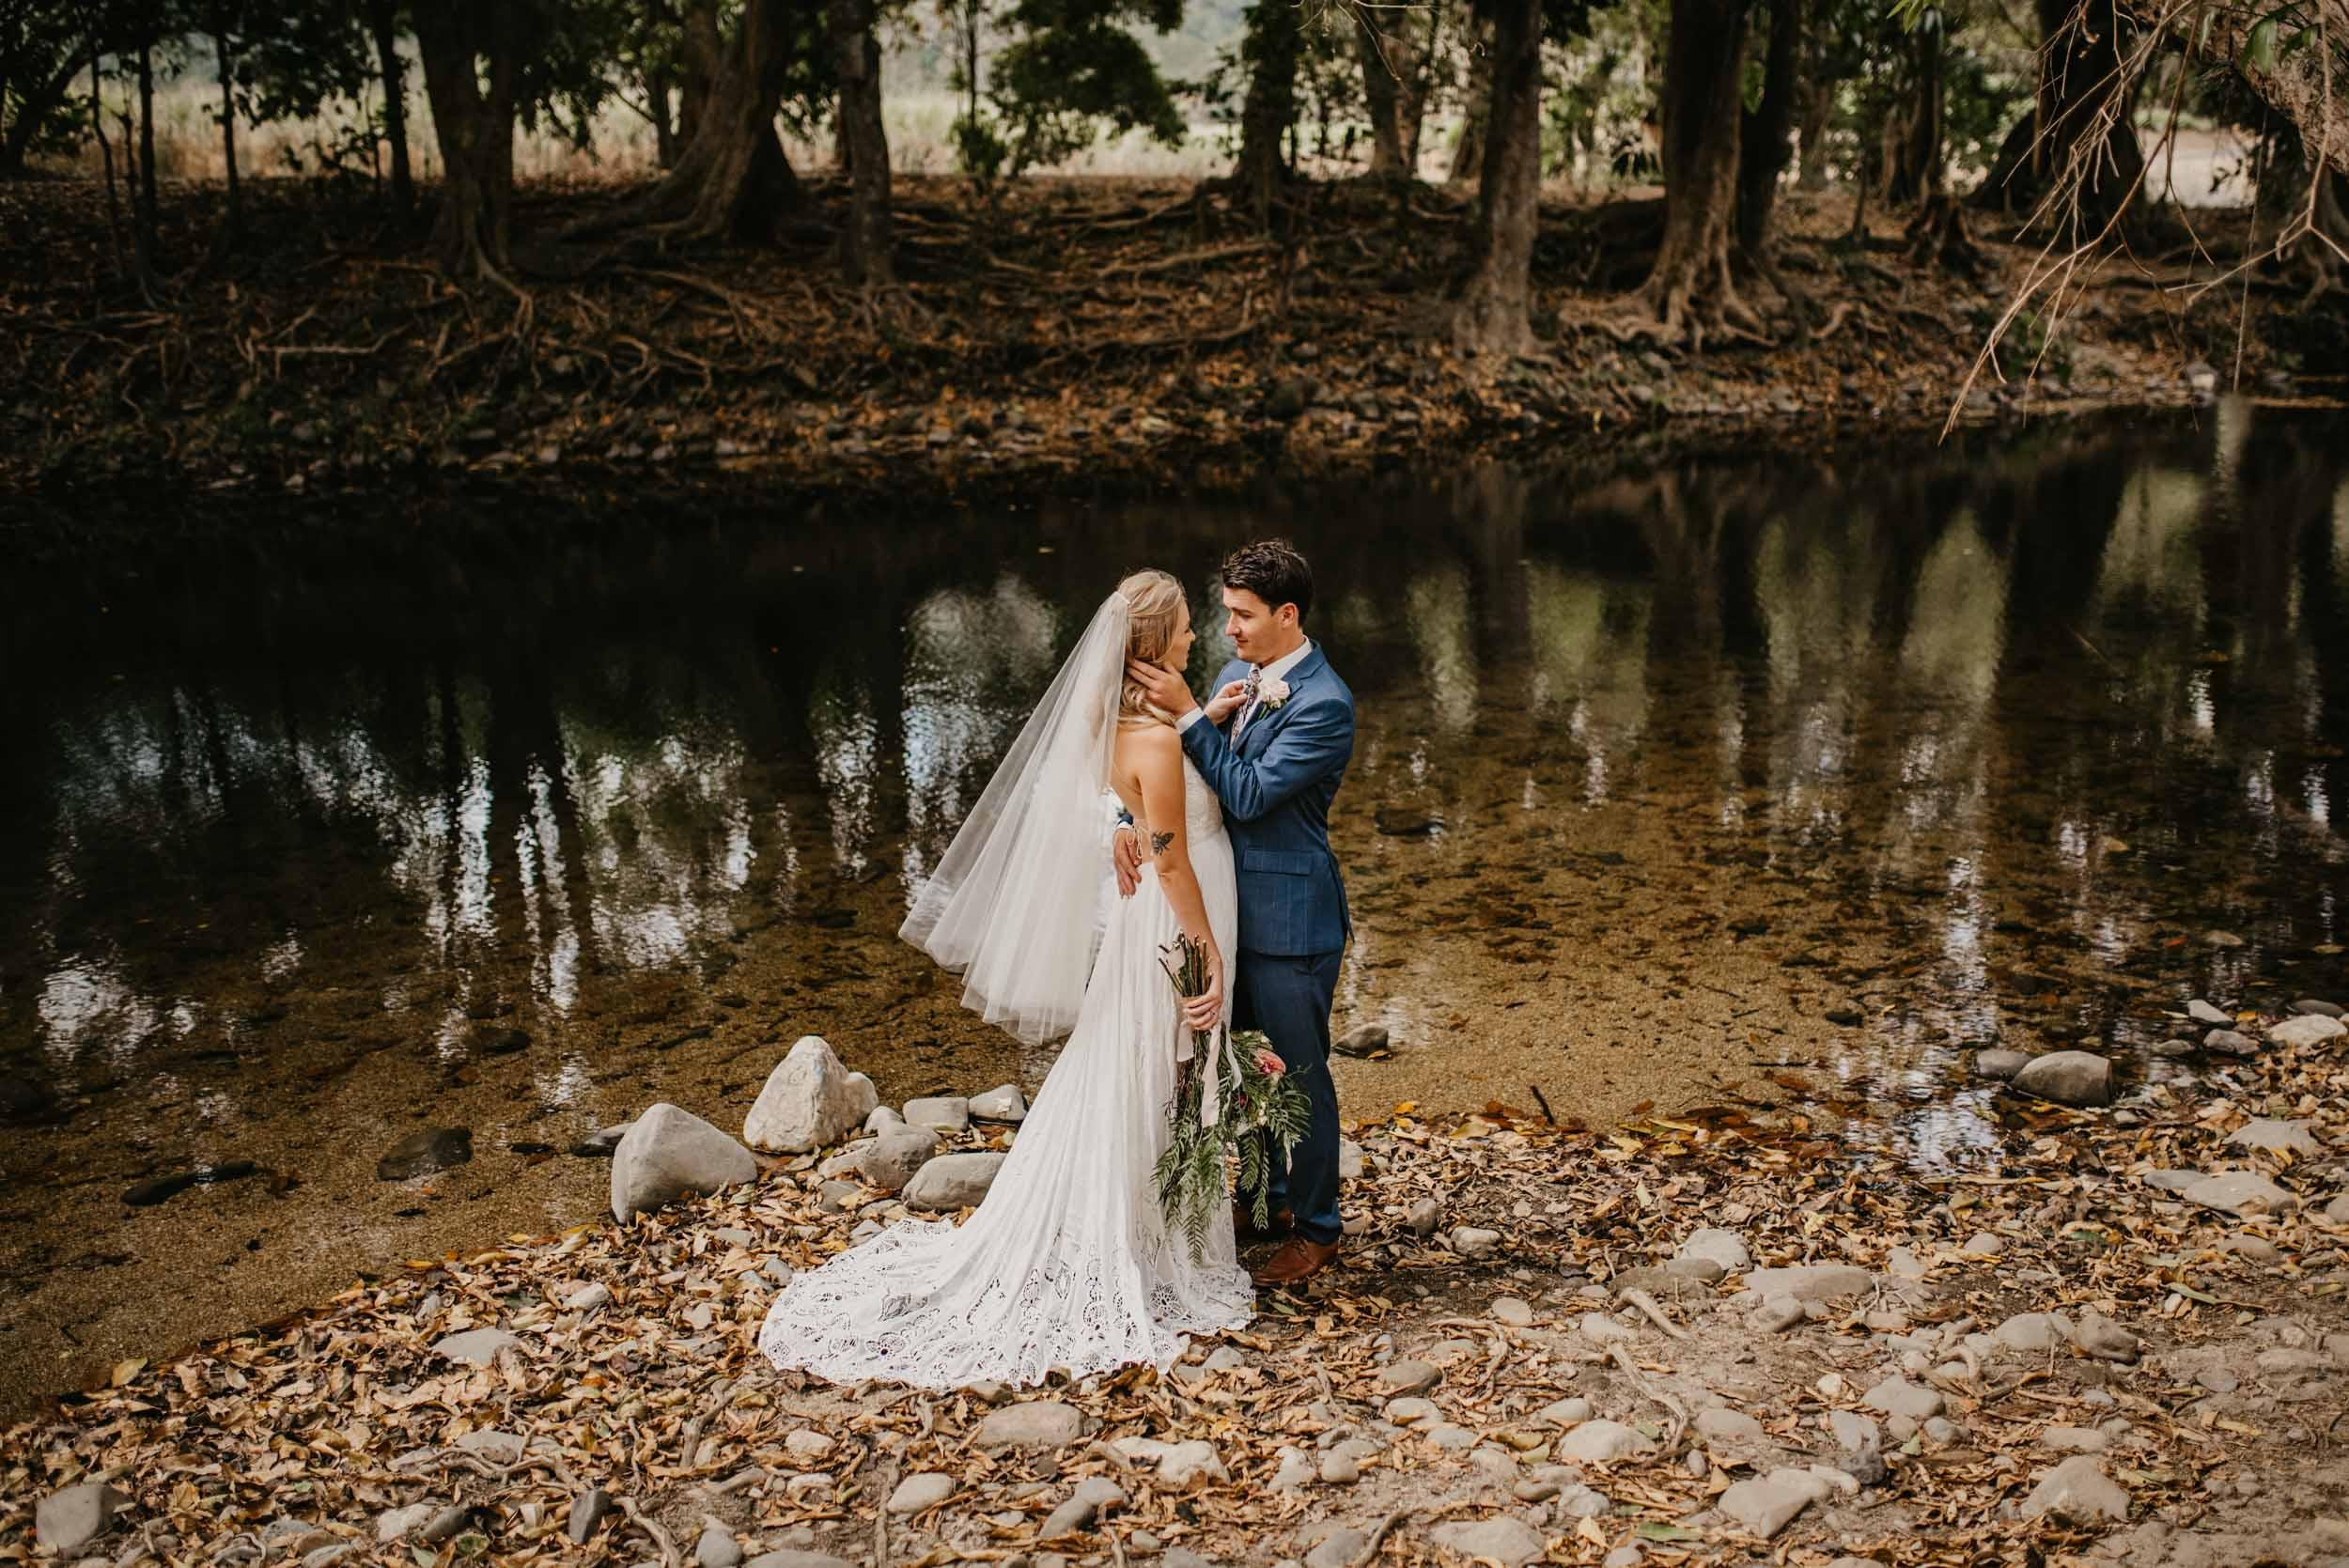 The Raw Photographer - Cairns Wedding Photographer - Laloli - Cairns Garden Wedding - Wedding Dress-49.jpg